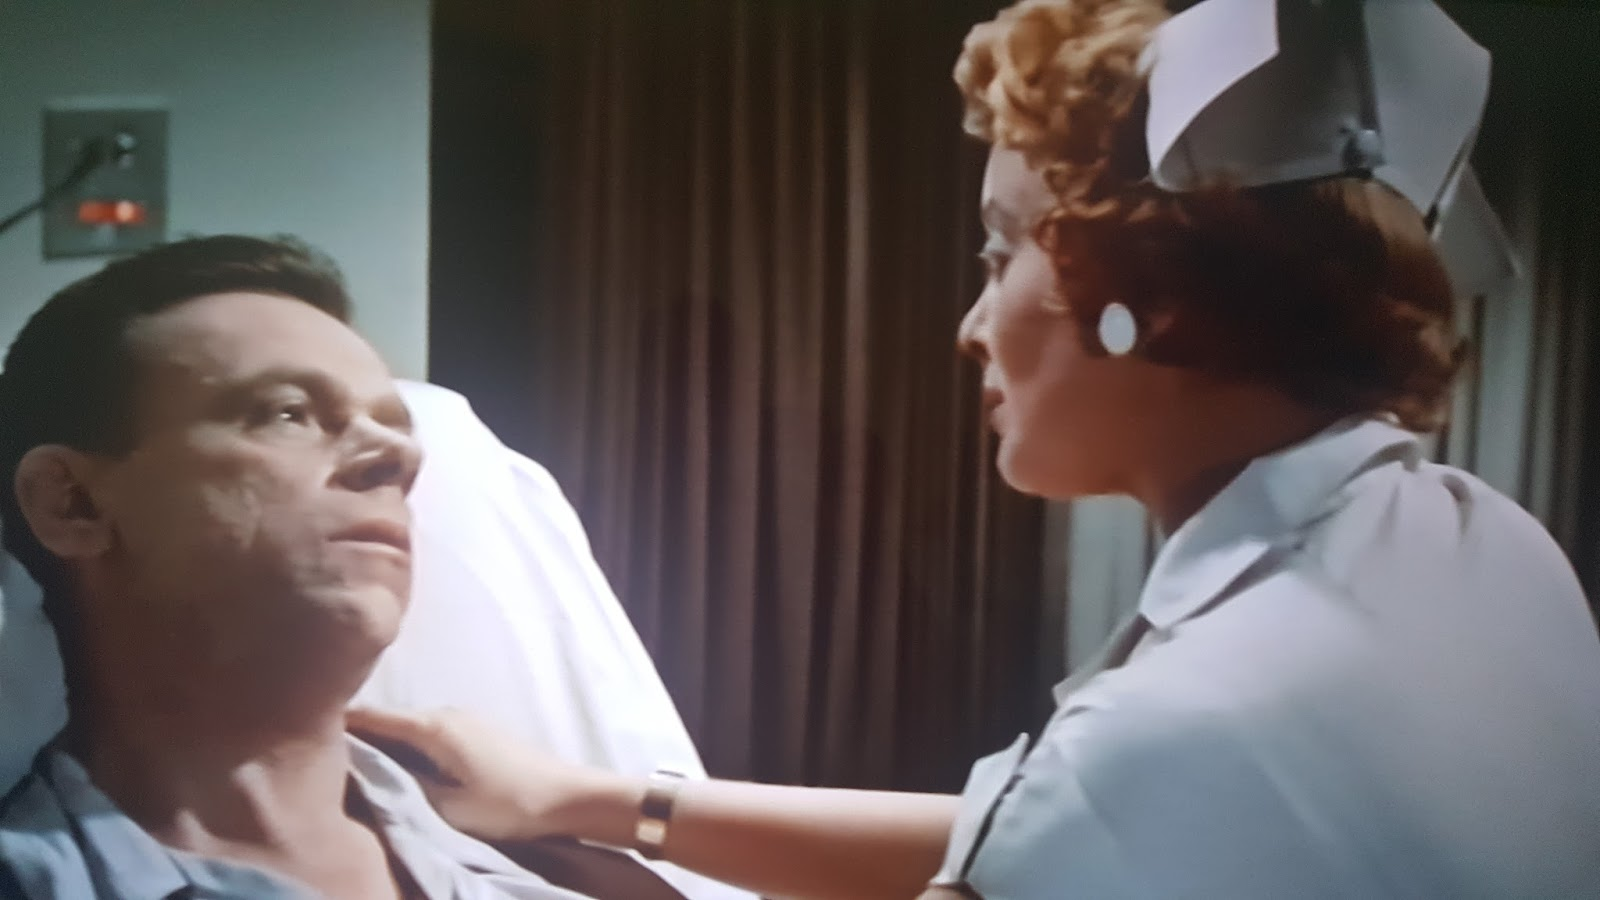 Sharmila Mandre,Earl W. Bascom Porn pics & movies Hamish McColl (born 1962),Danielle Sharp